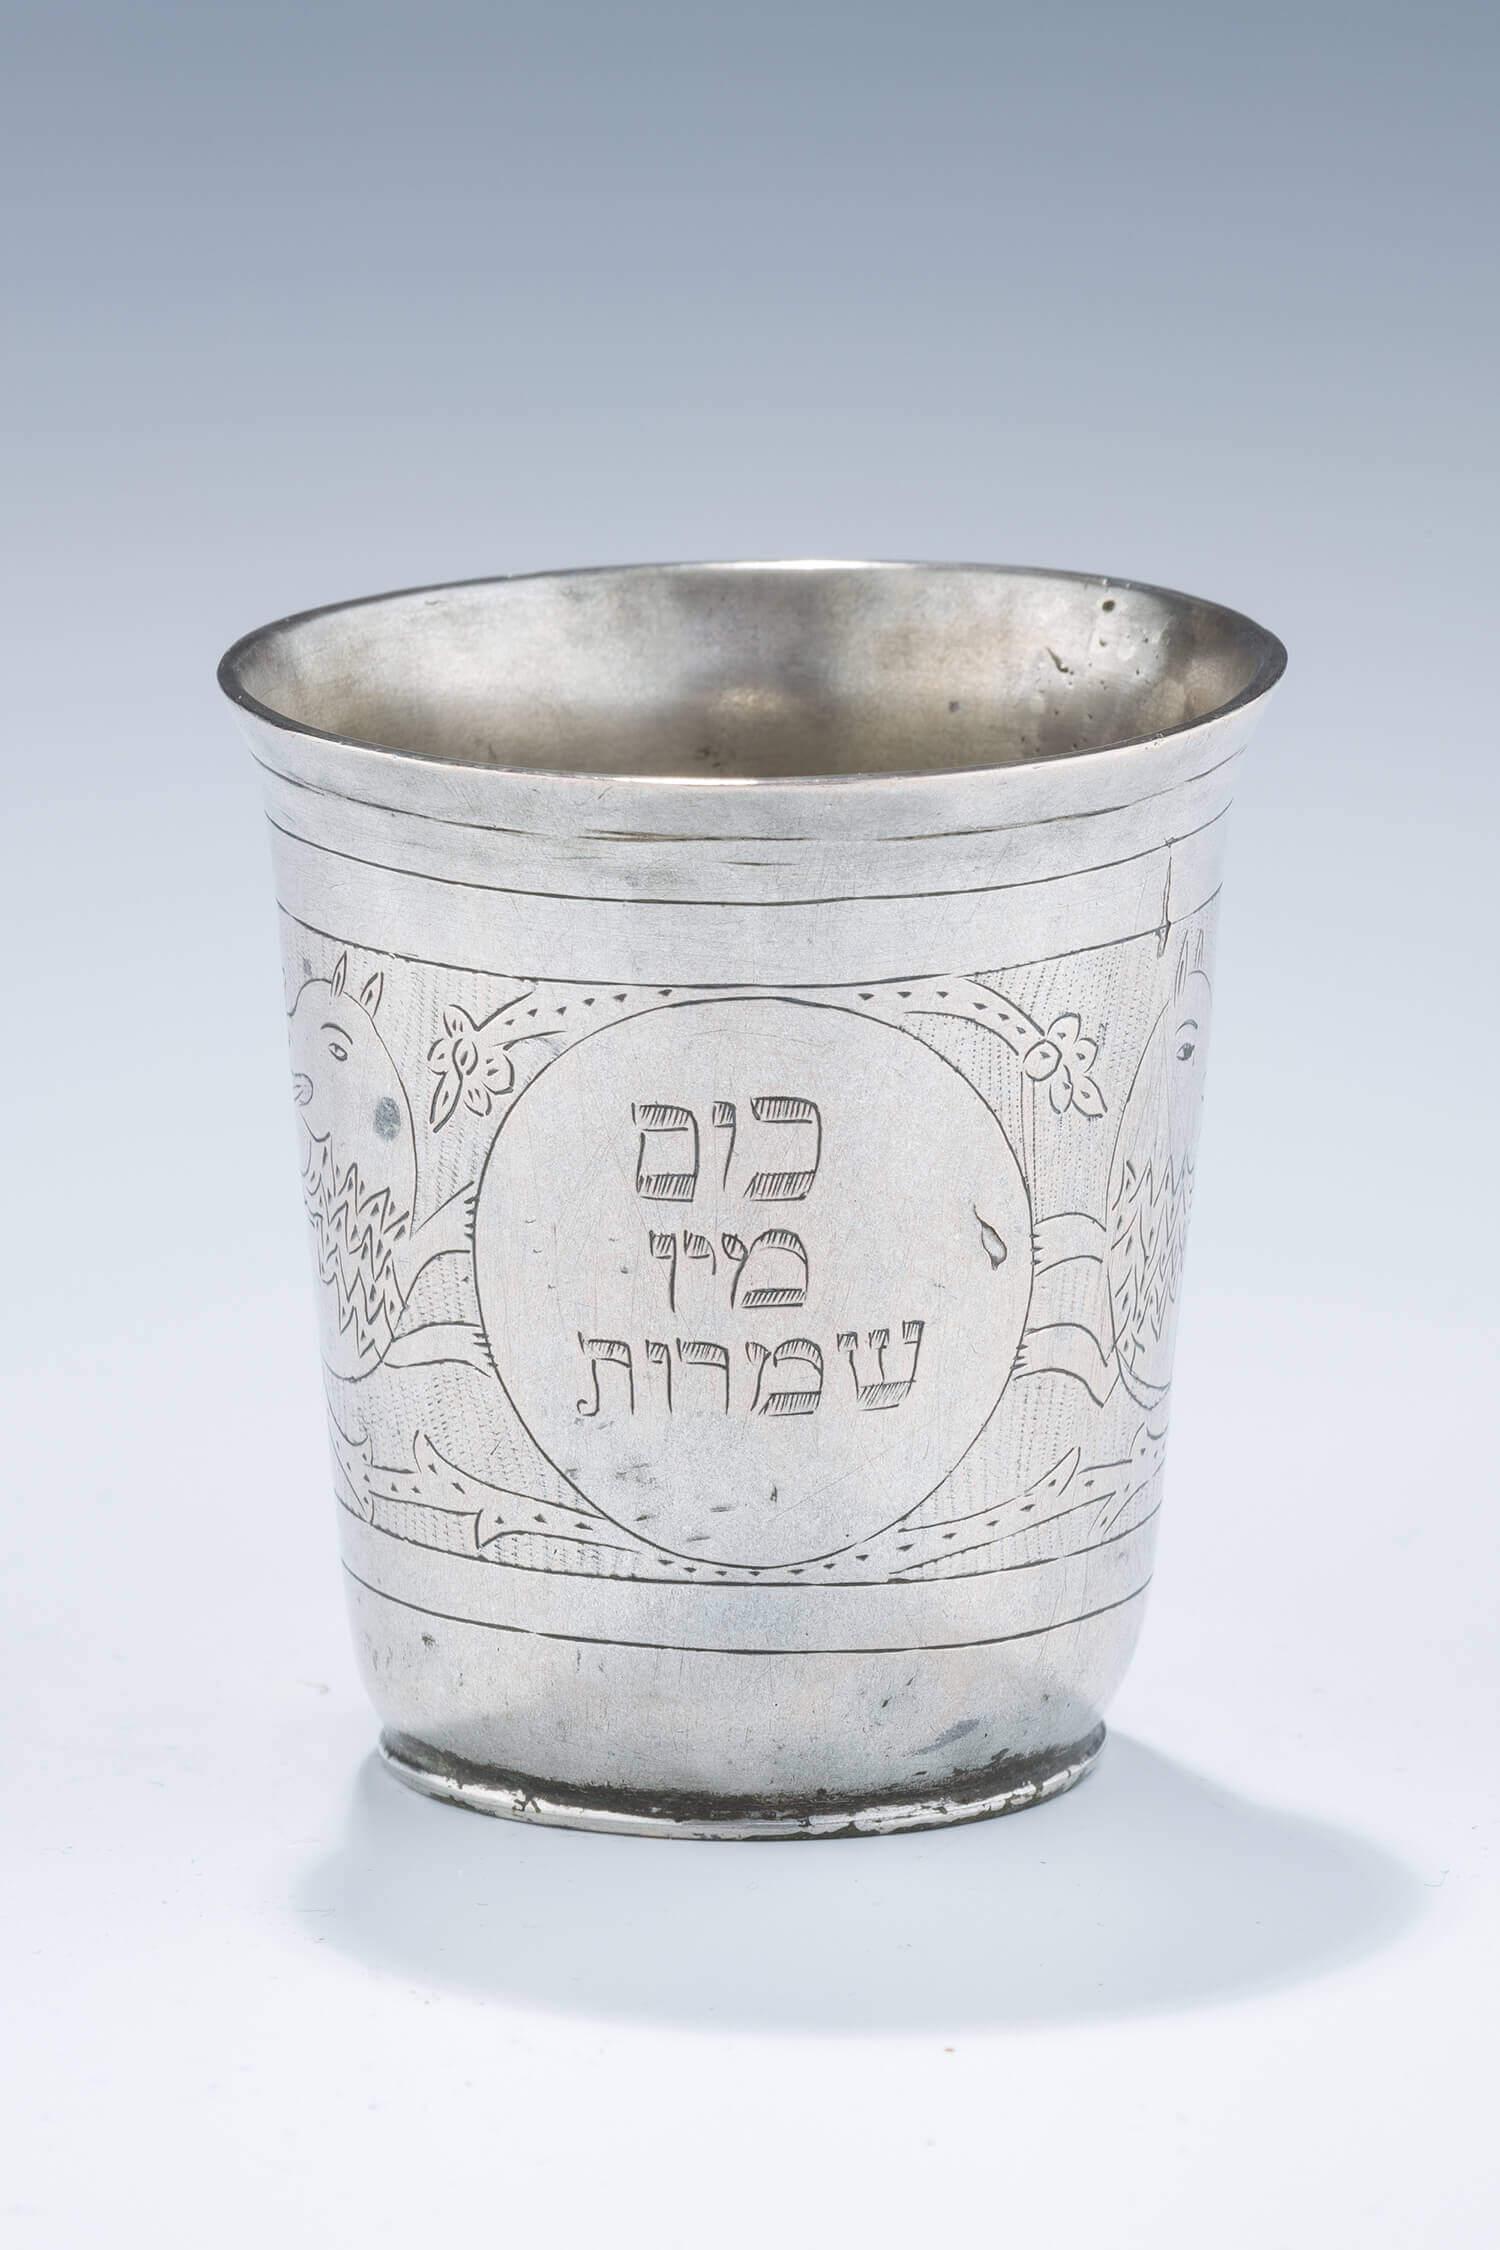 061. A RARE SILVER SHMIROT KIDDUSH CUP